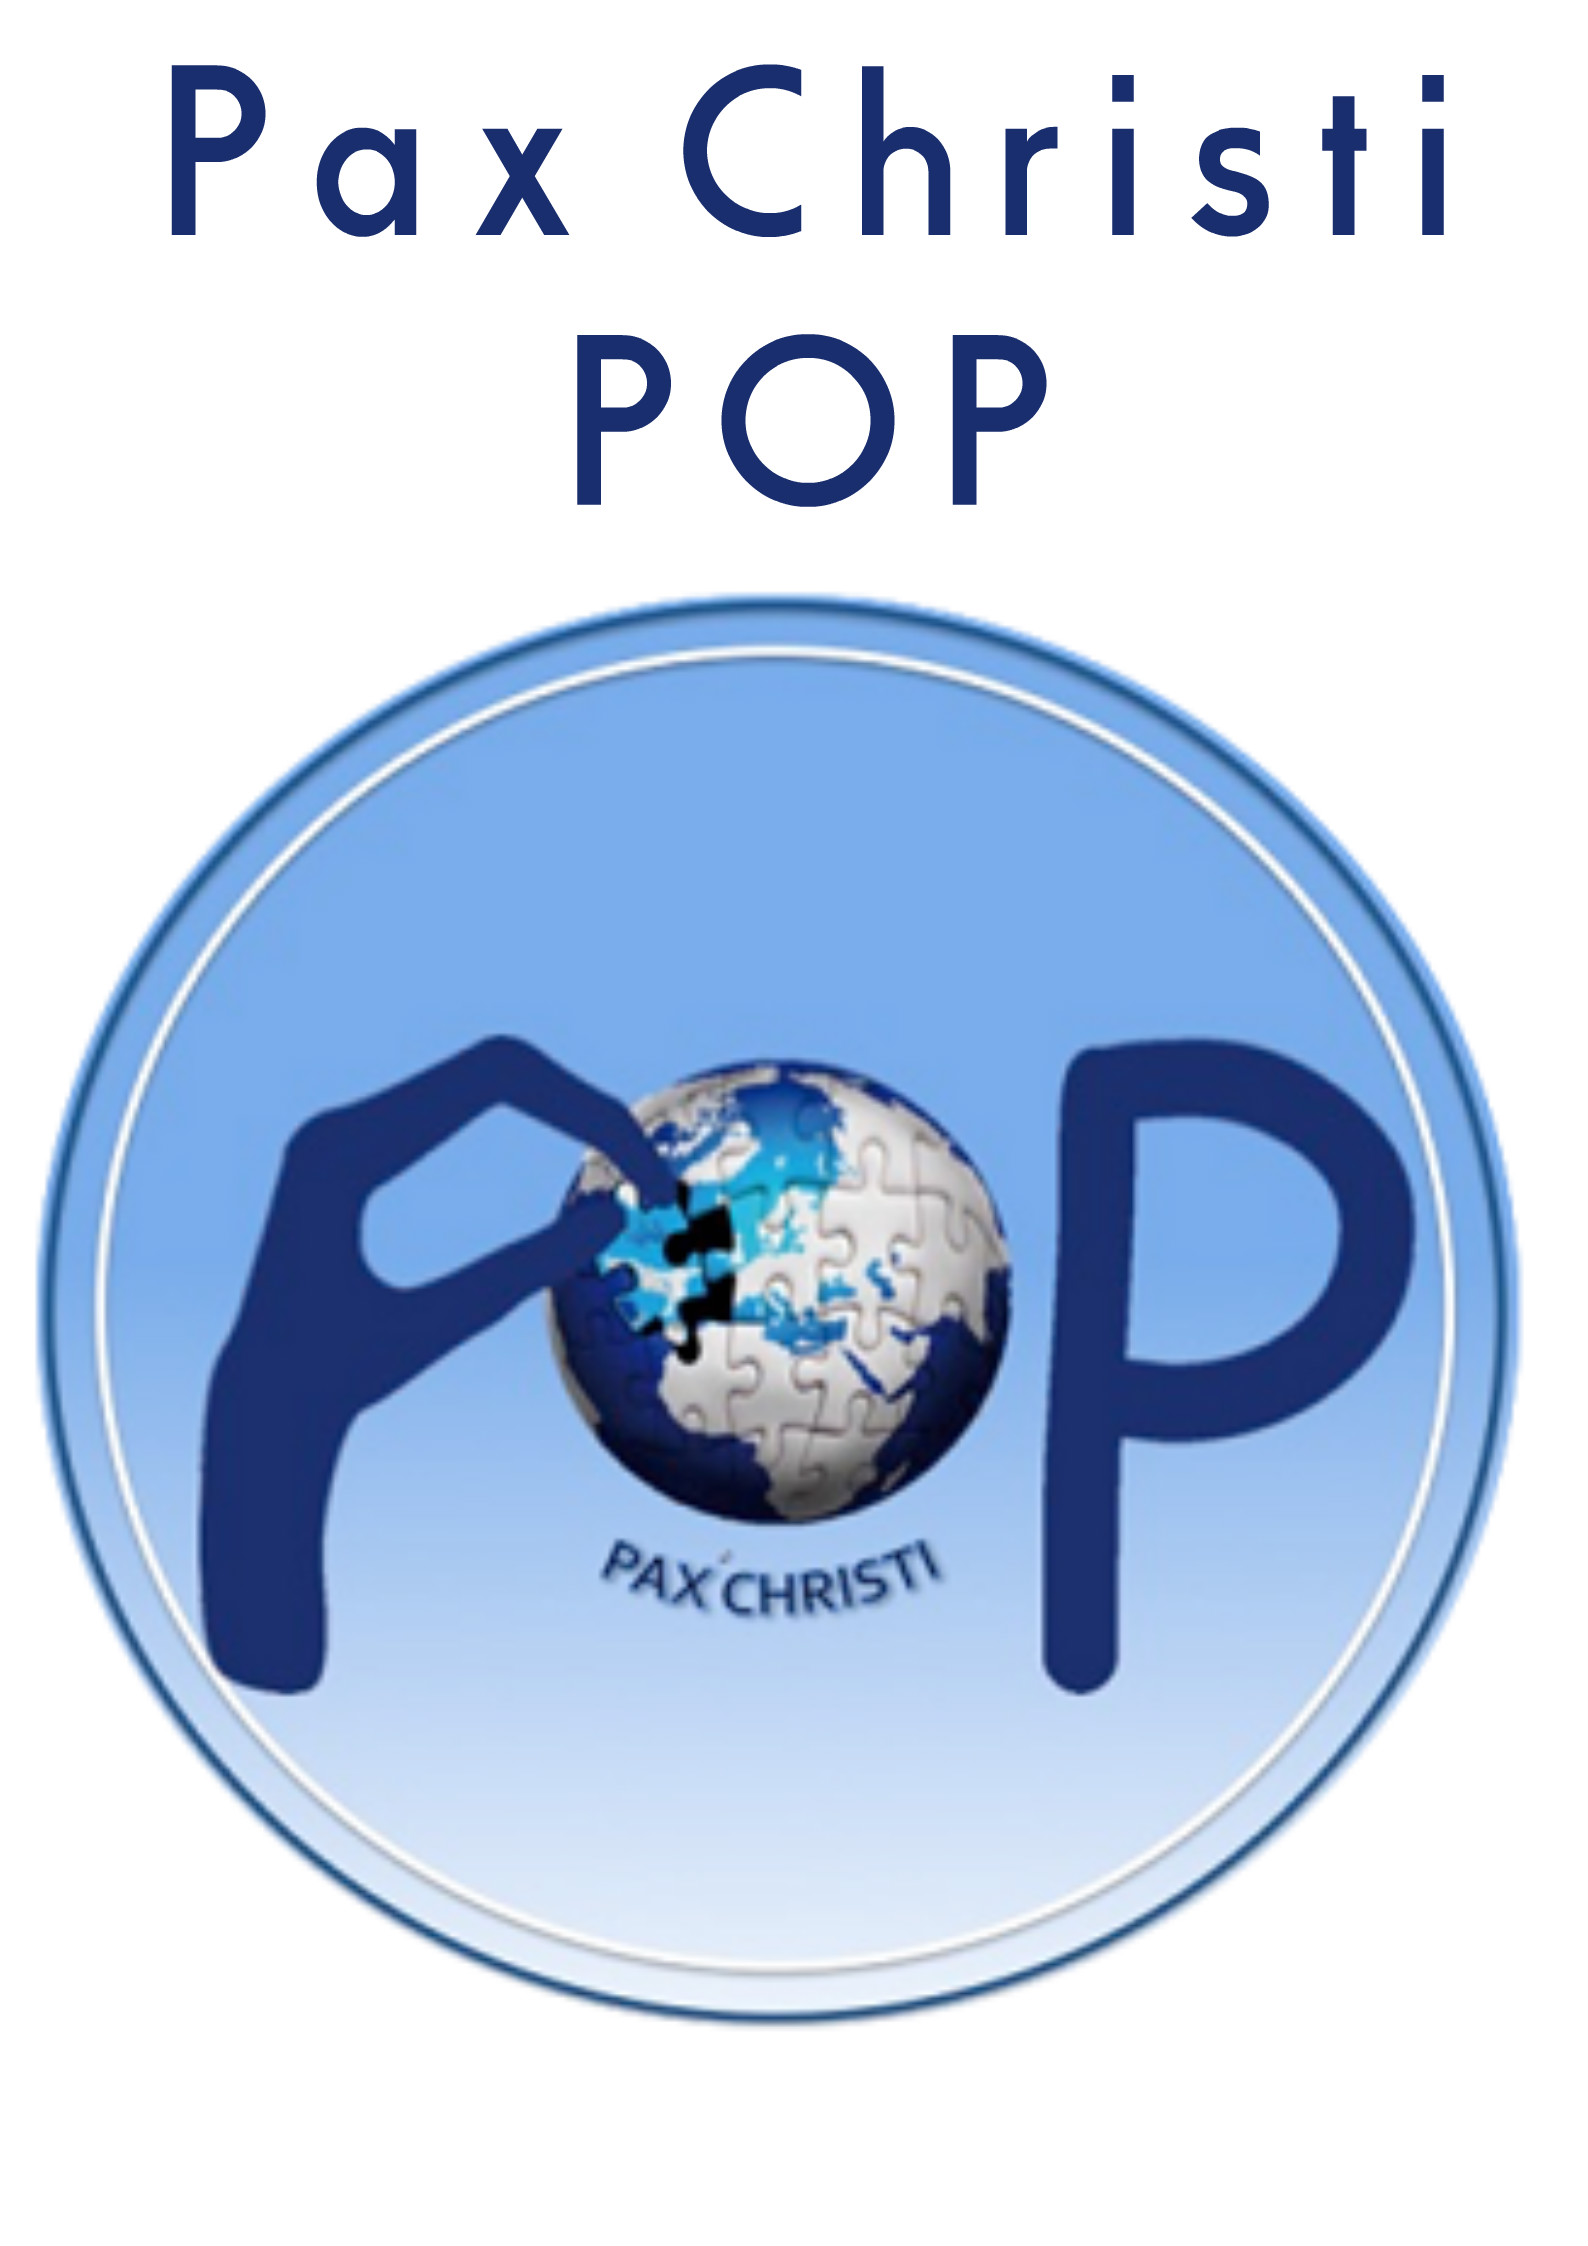 PAX CHRISTI POP